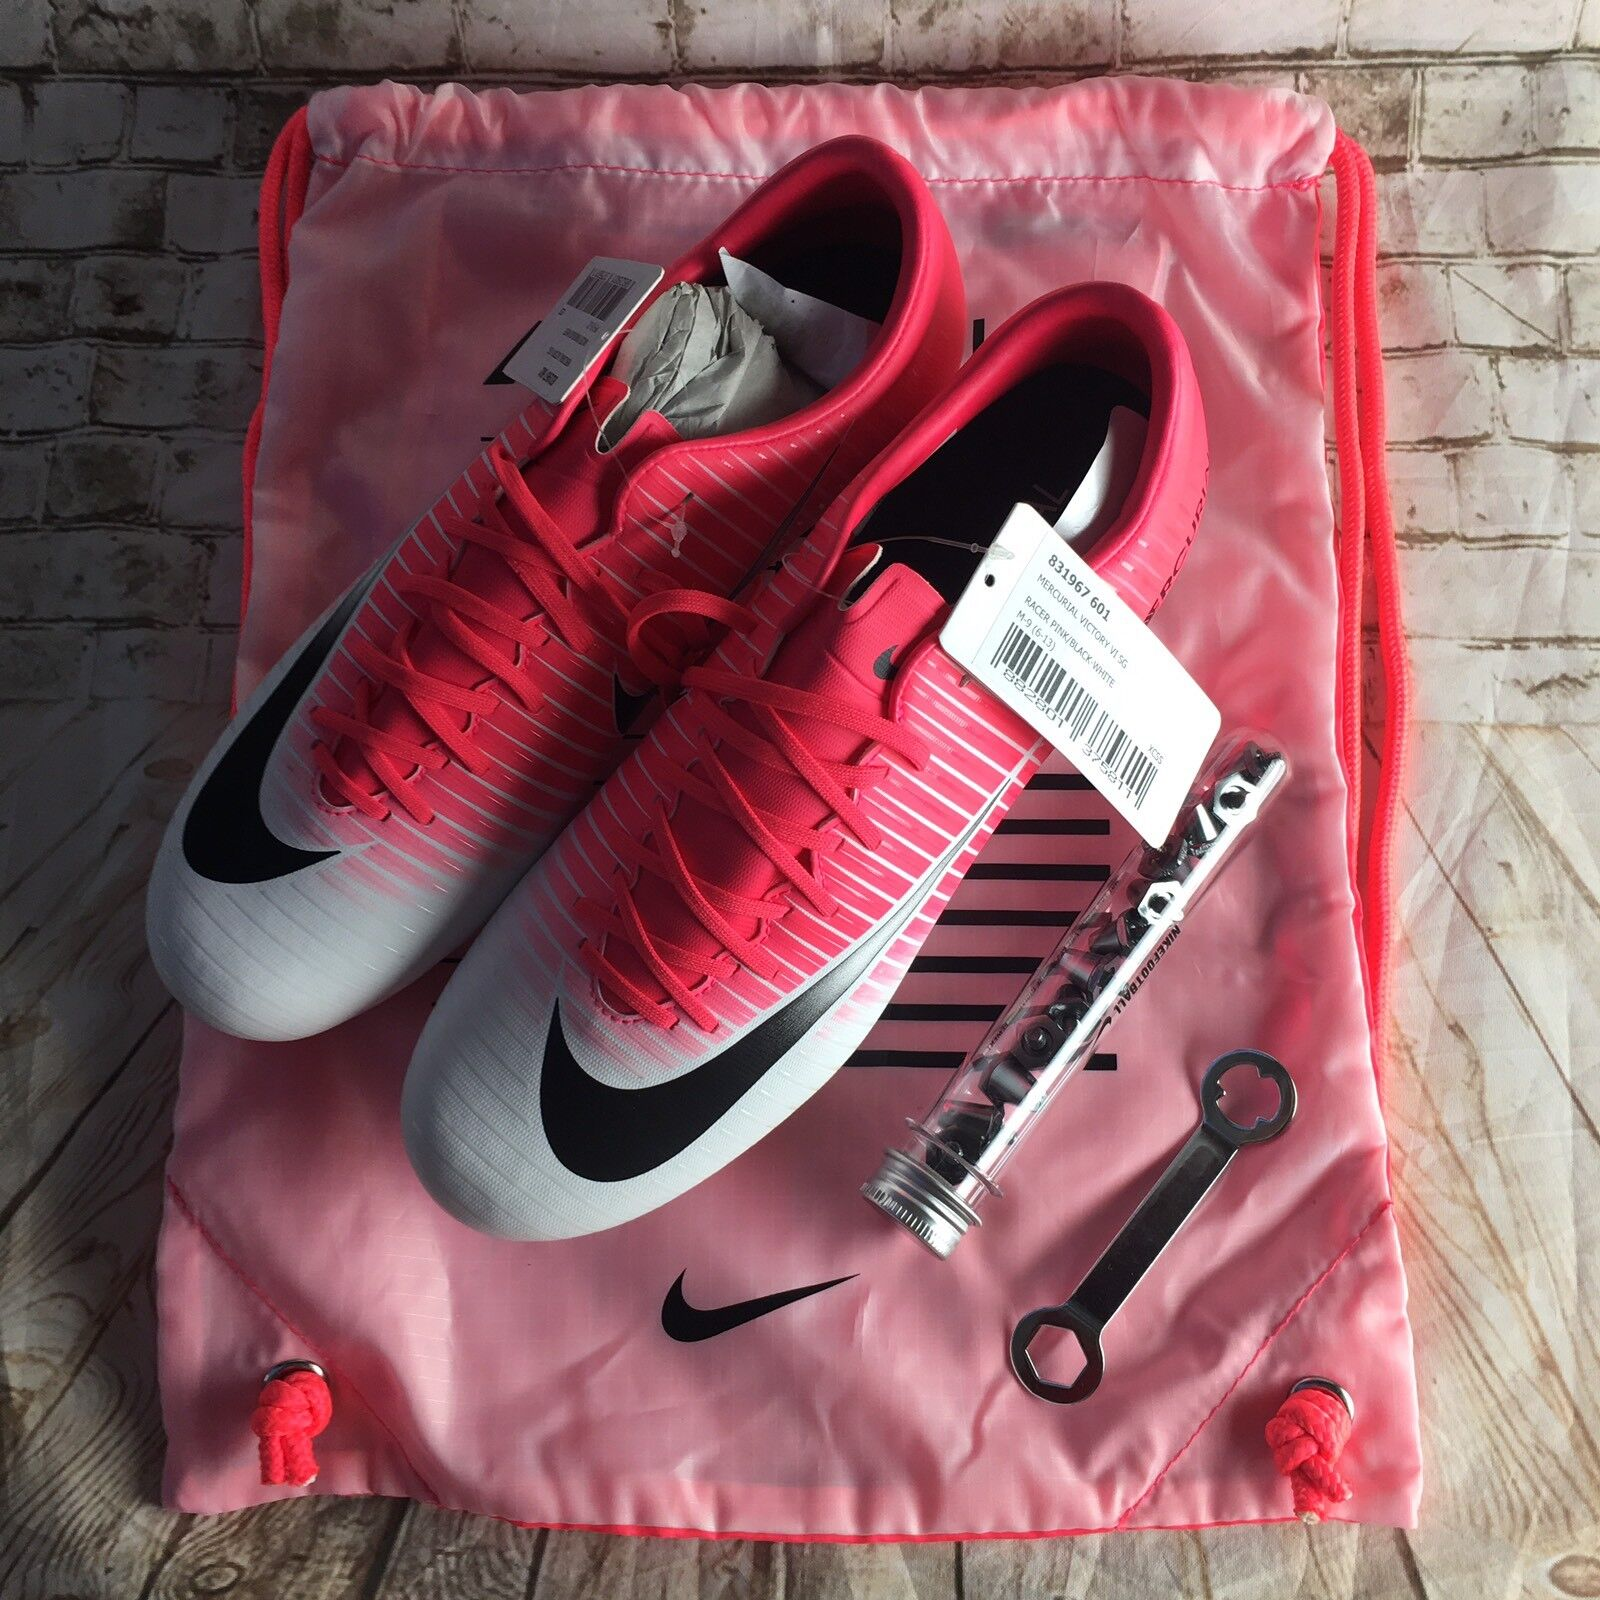 Nike Mercurial Victory VI Mens Football Boots 831967-601 Pink Soccer Cleats Sz 9